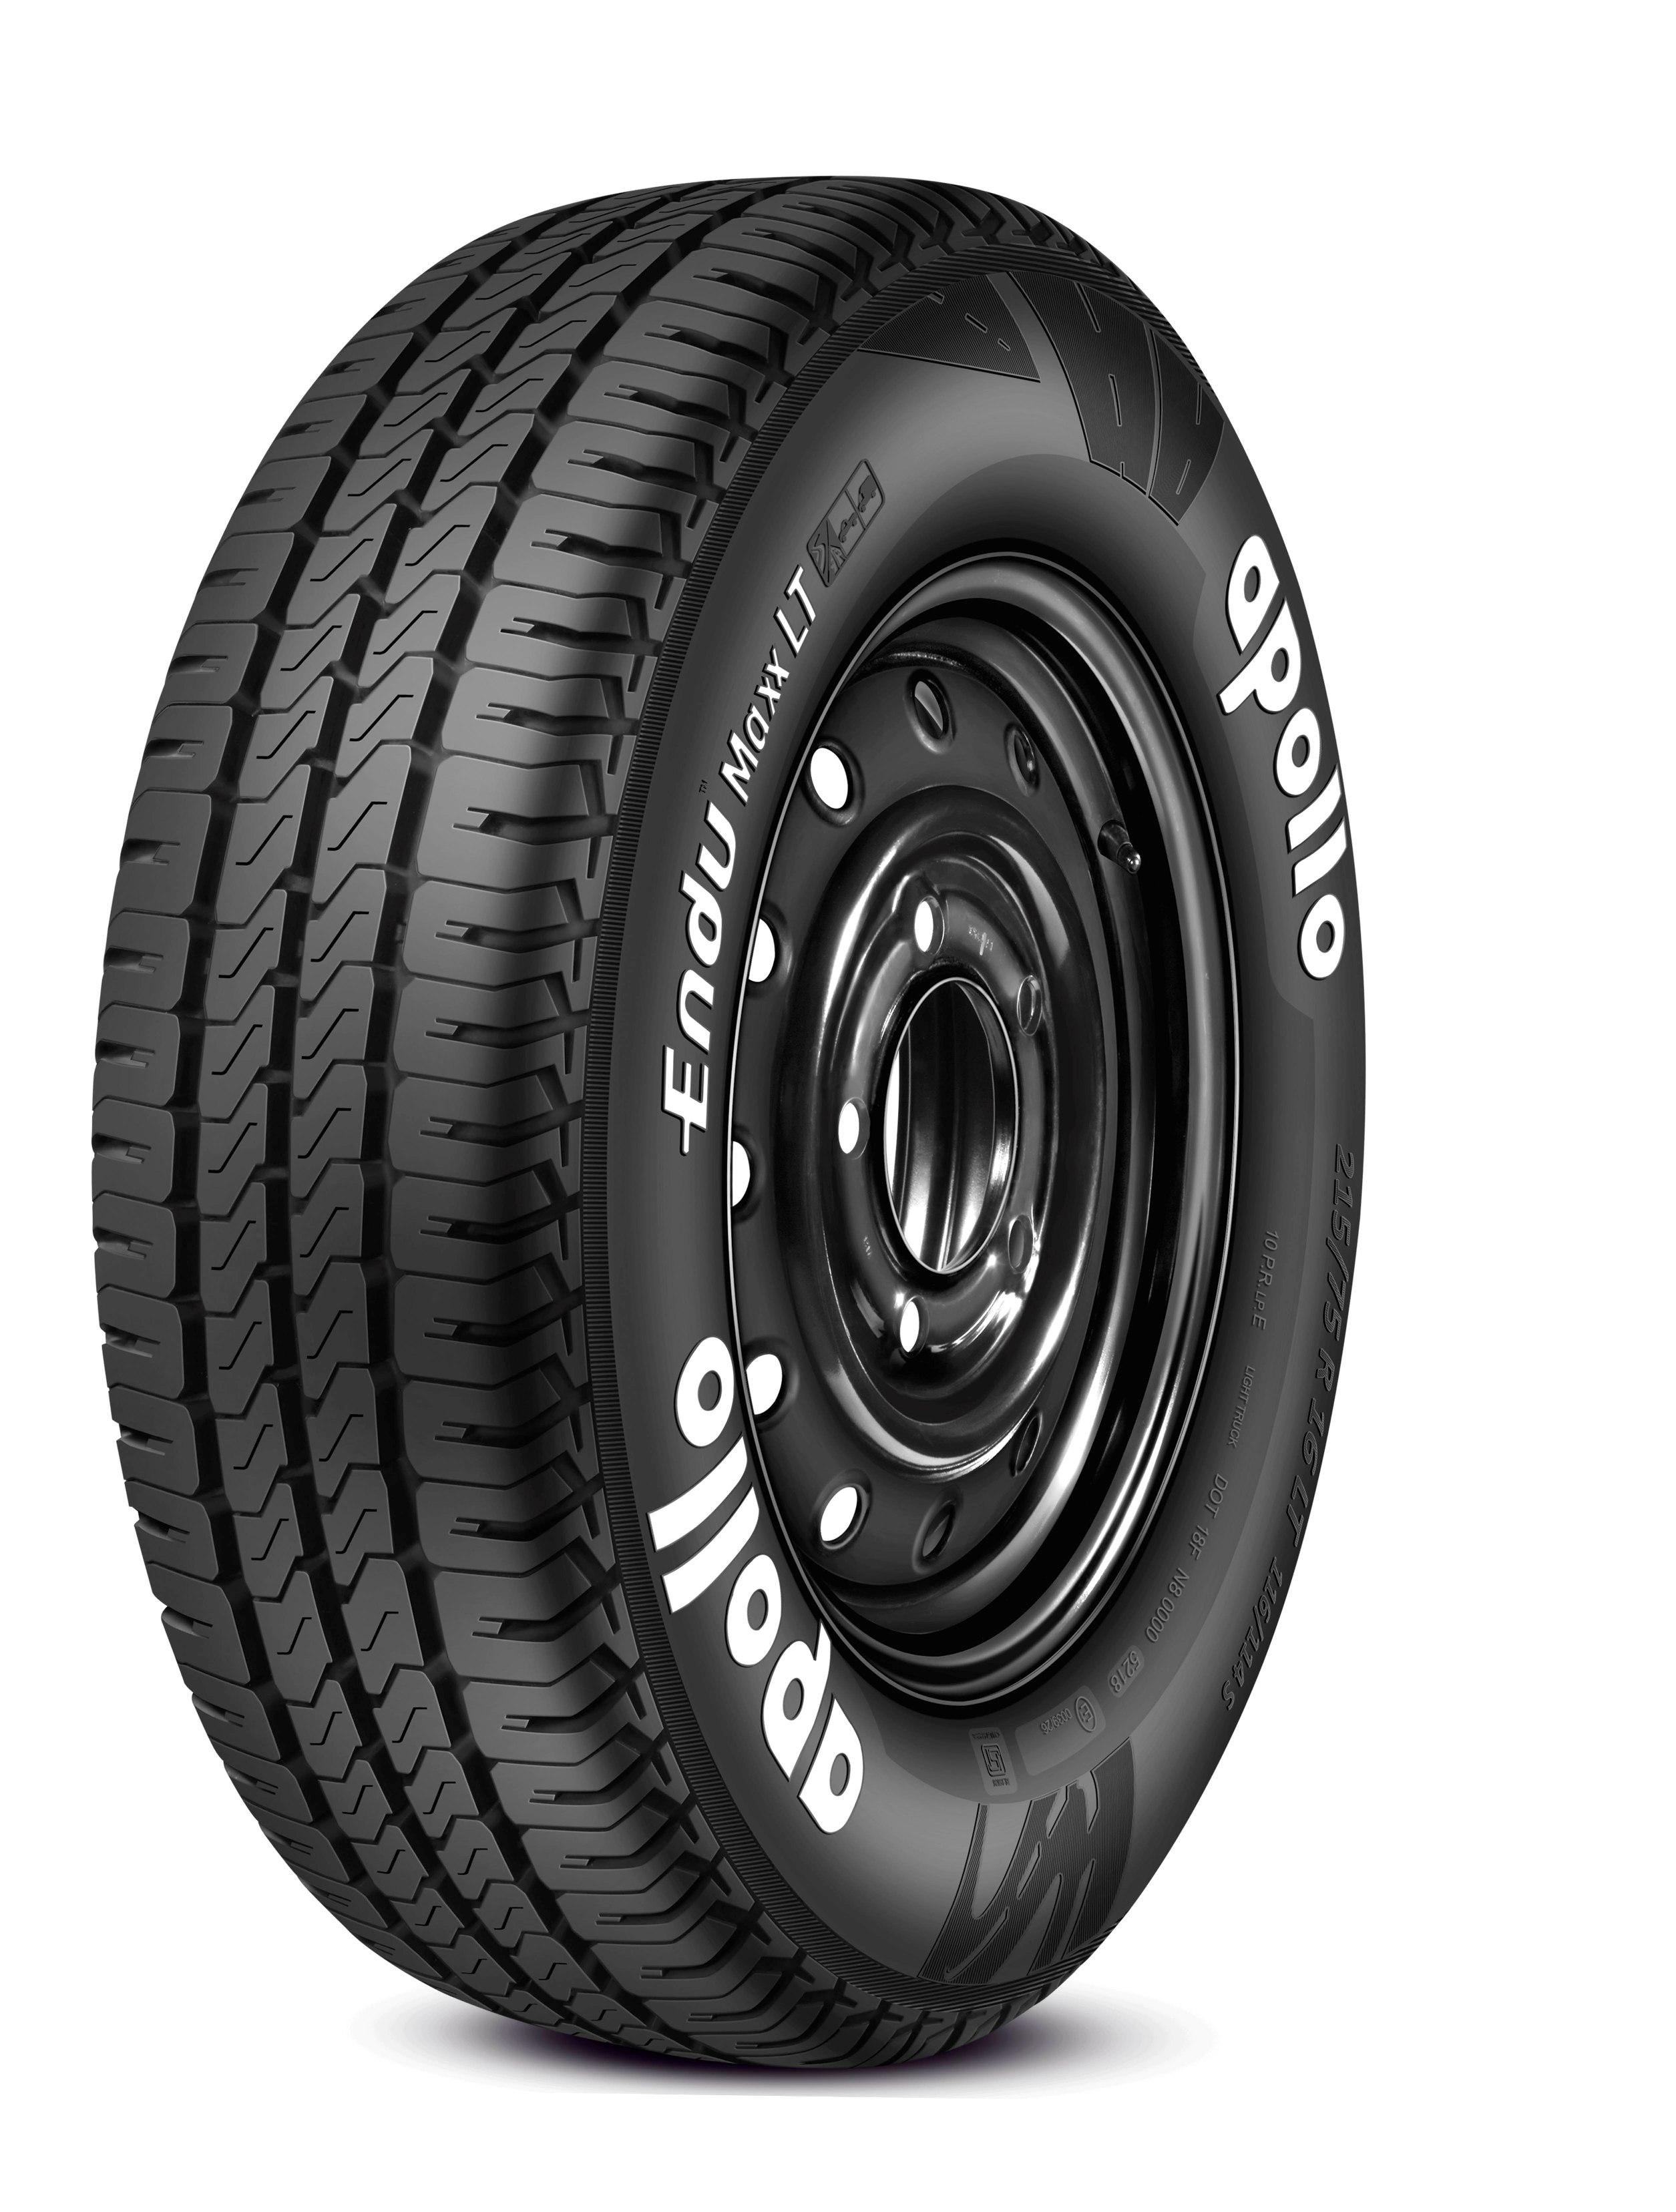 Apollo Tyres Debuts EnduMaxx brand of Light Truck Tires